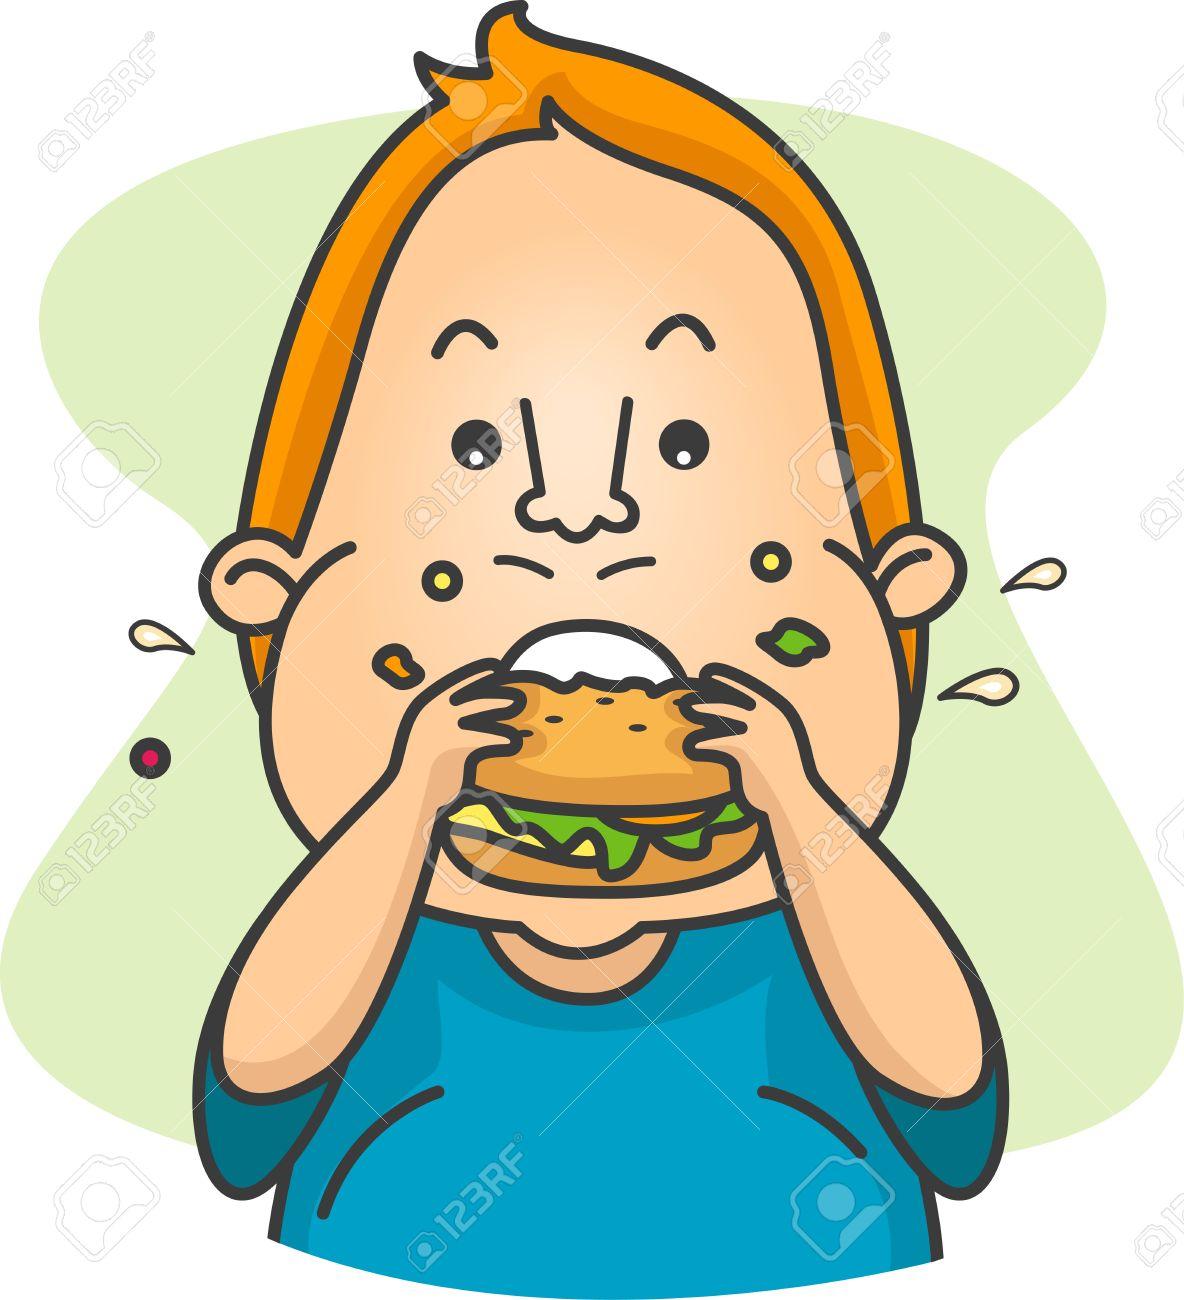 Similiar Guy Eating Cheeseburger Clip Art Keywords.